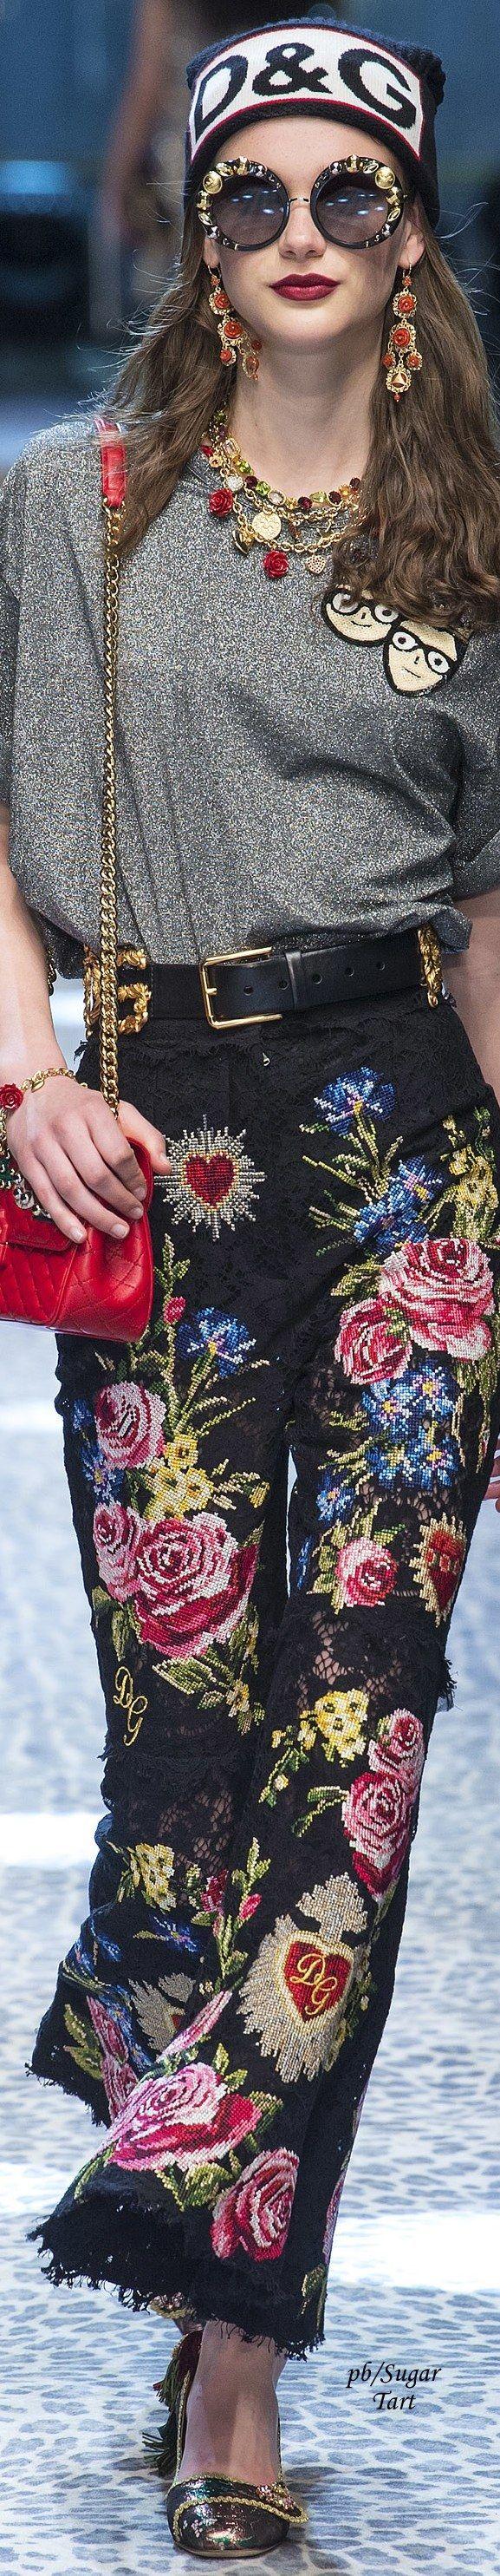 Dolce & Gabbana Fall 2017 *☆ ♡ ριntєrєѕt: ♕ριnkɑndvєlvєƗ♕ |ιnstagram: thєριnkɑndvєlvєƗ | ριnkɑndvєlvєƗ.com #pinkandvelvet #fashion